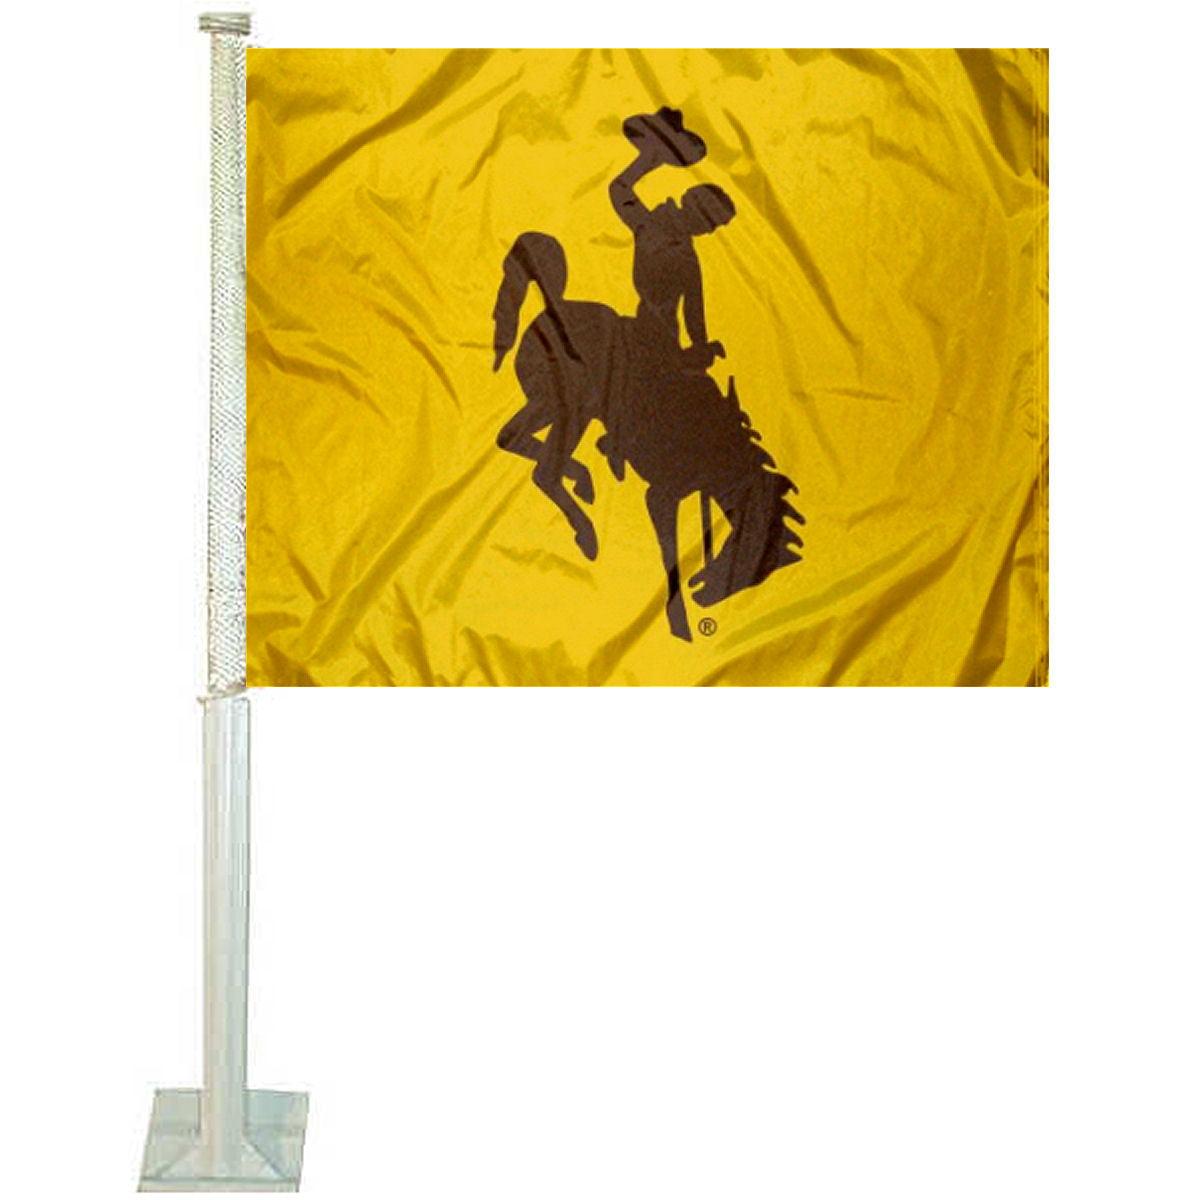 "University of Wyoming Gold 12"" x 15"" Car Flag"